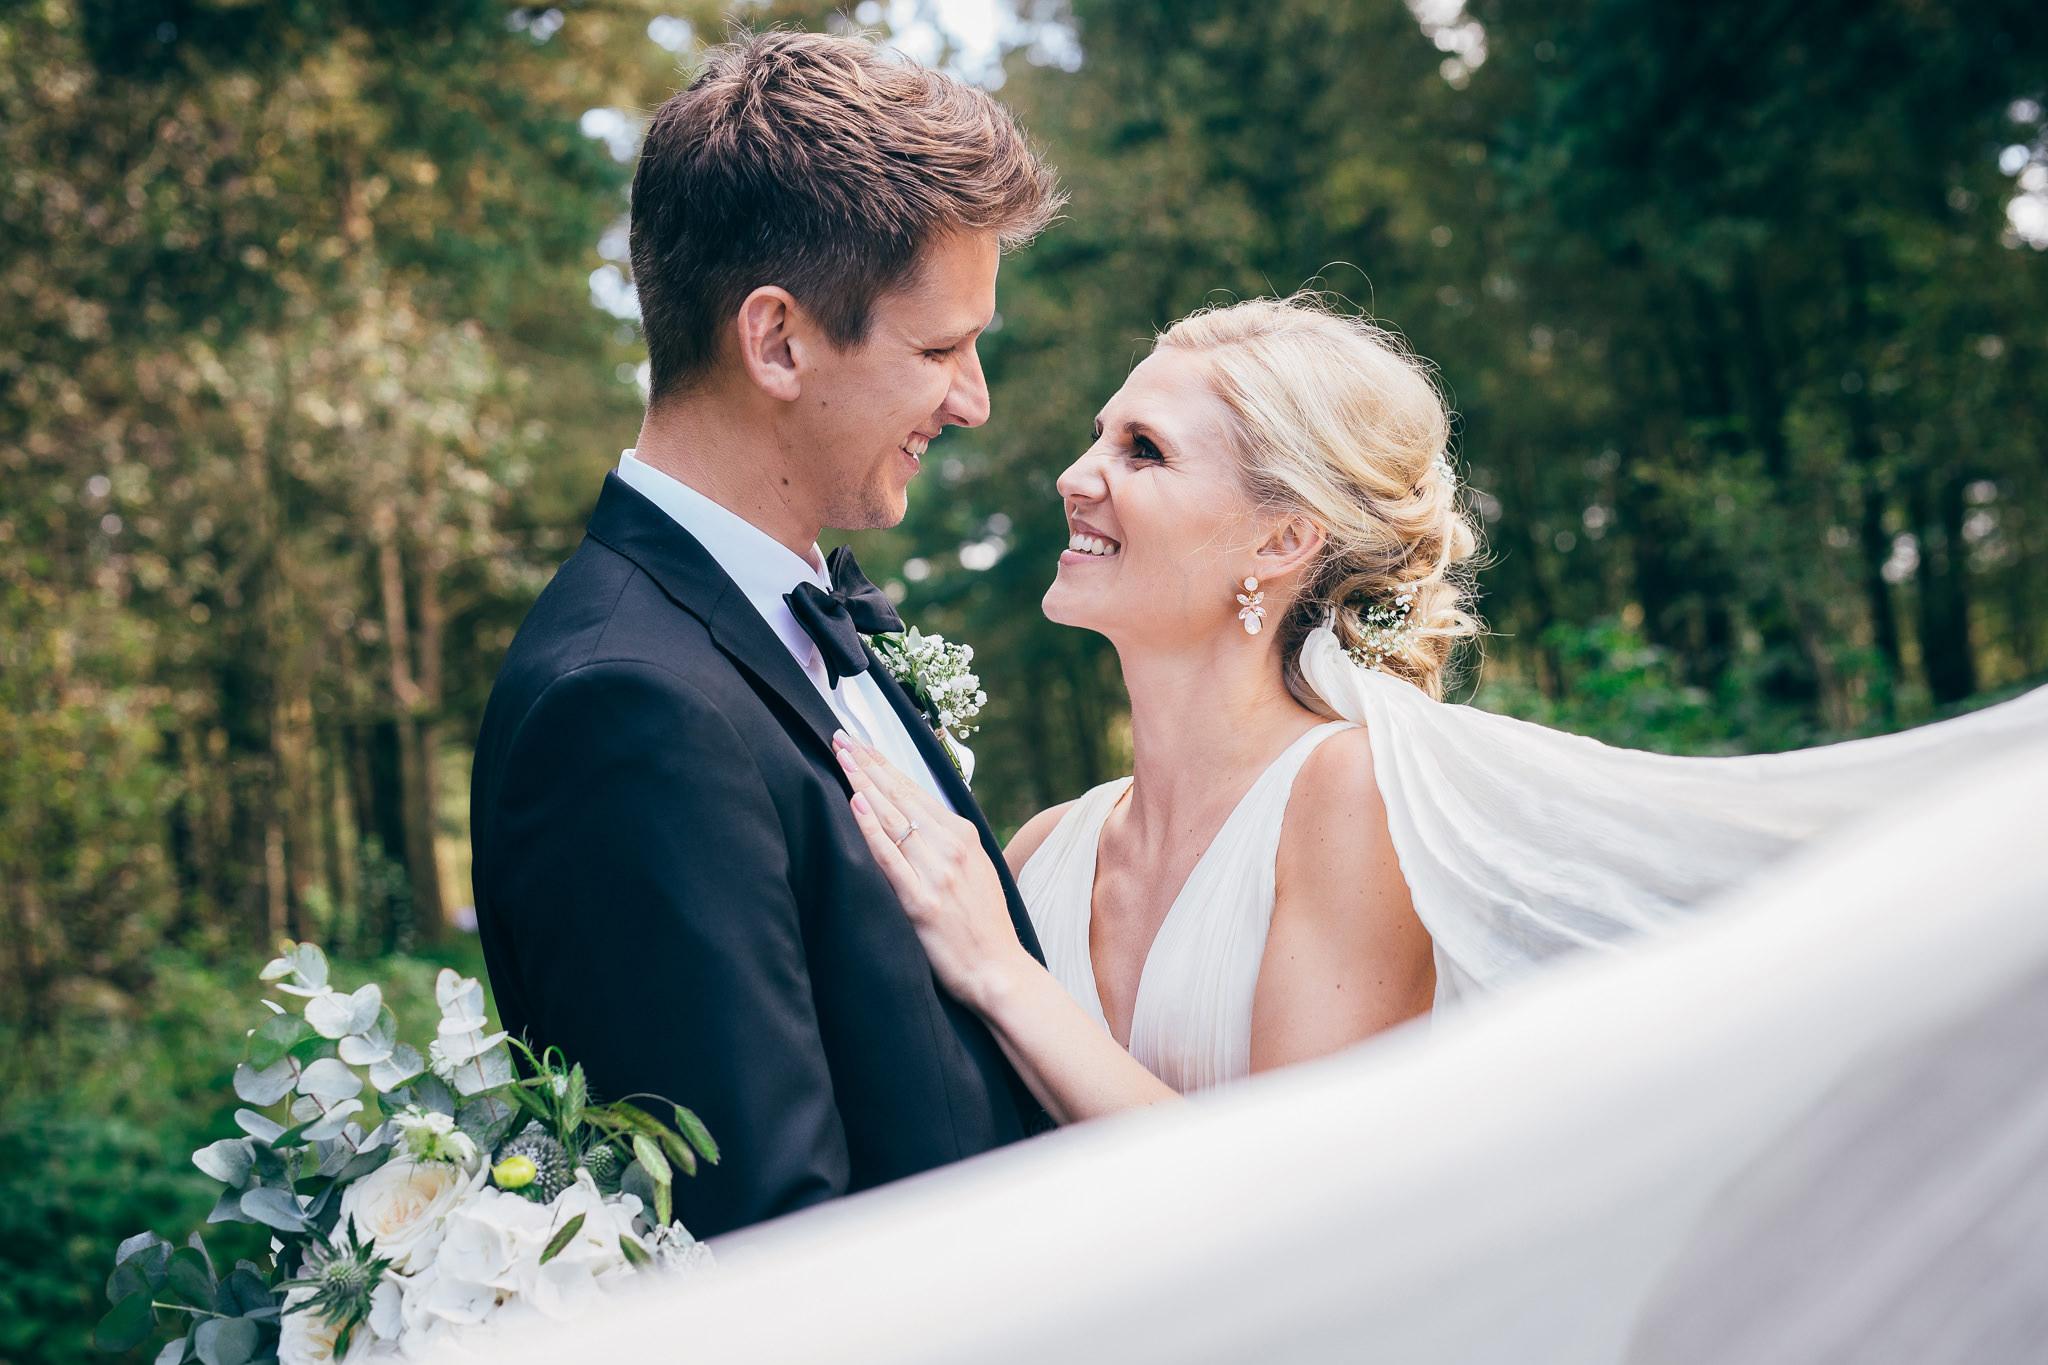 Norway+wedding+photographer+elopement+pre+wedding+Rogaland+bryllupsfotograf+Casey+Arneson-205.jpg